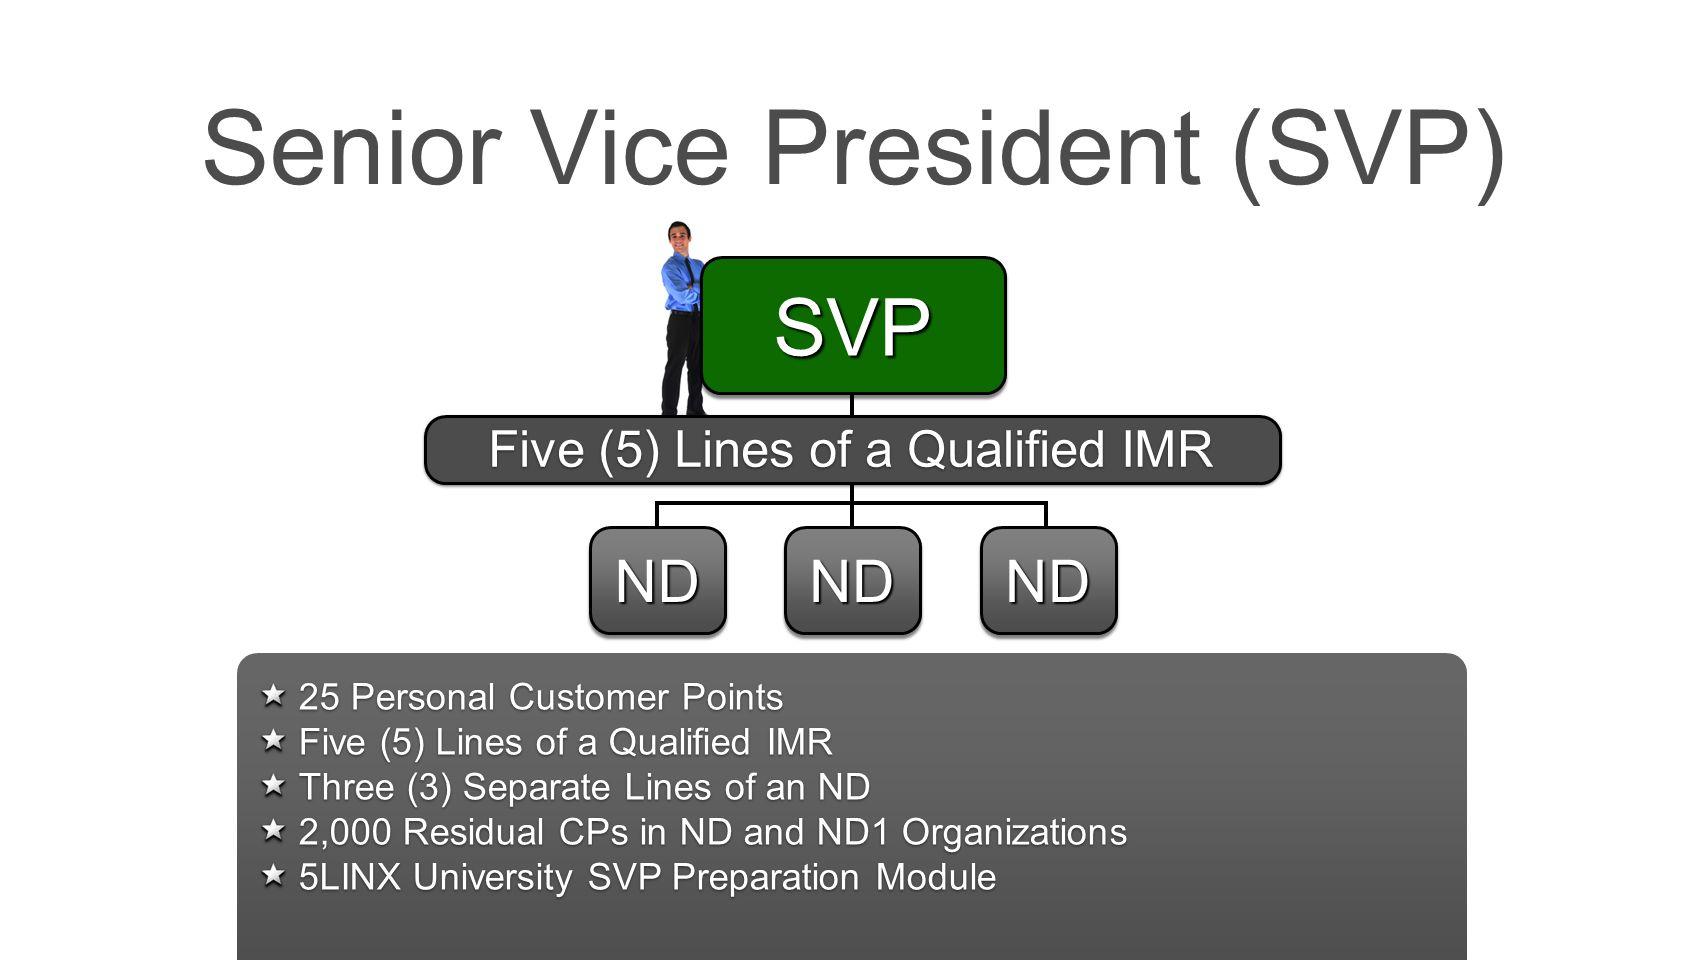 Senior Vice President (SVP)